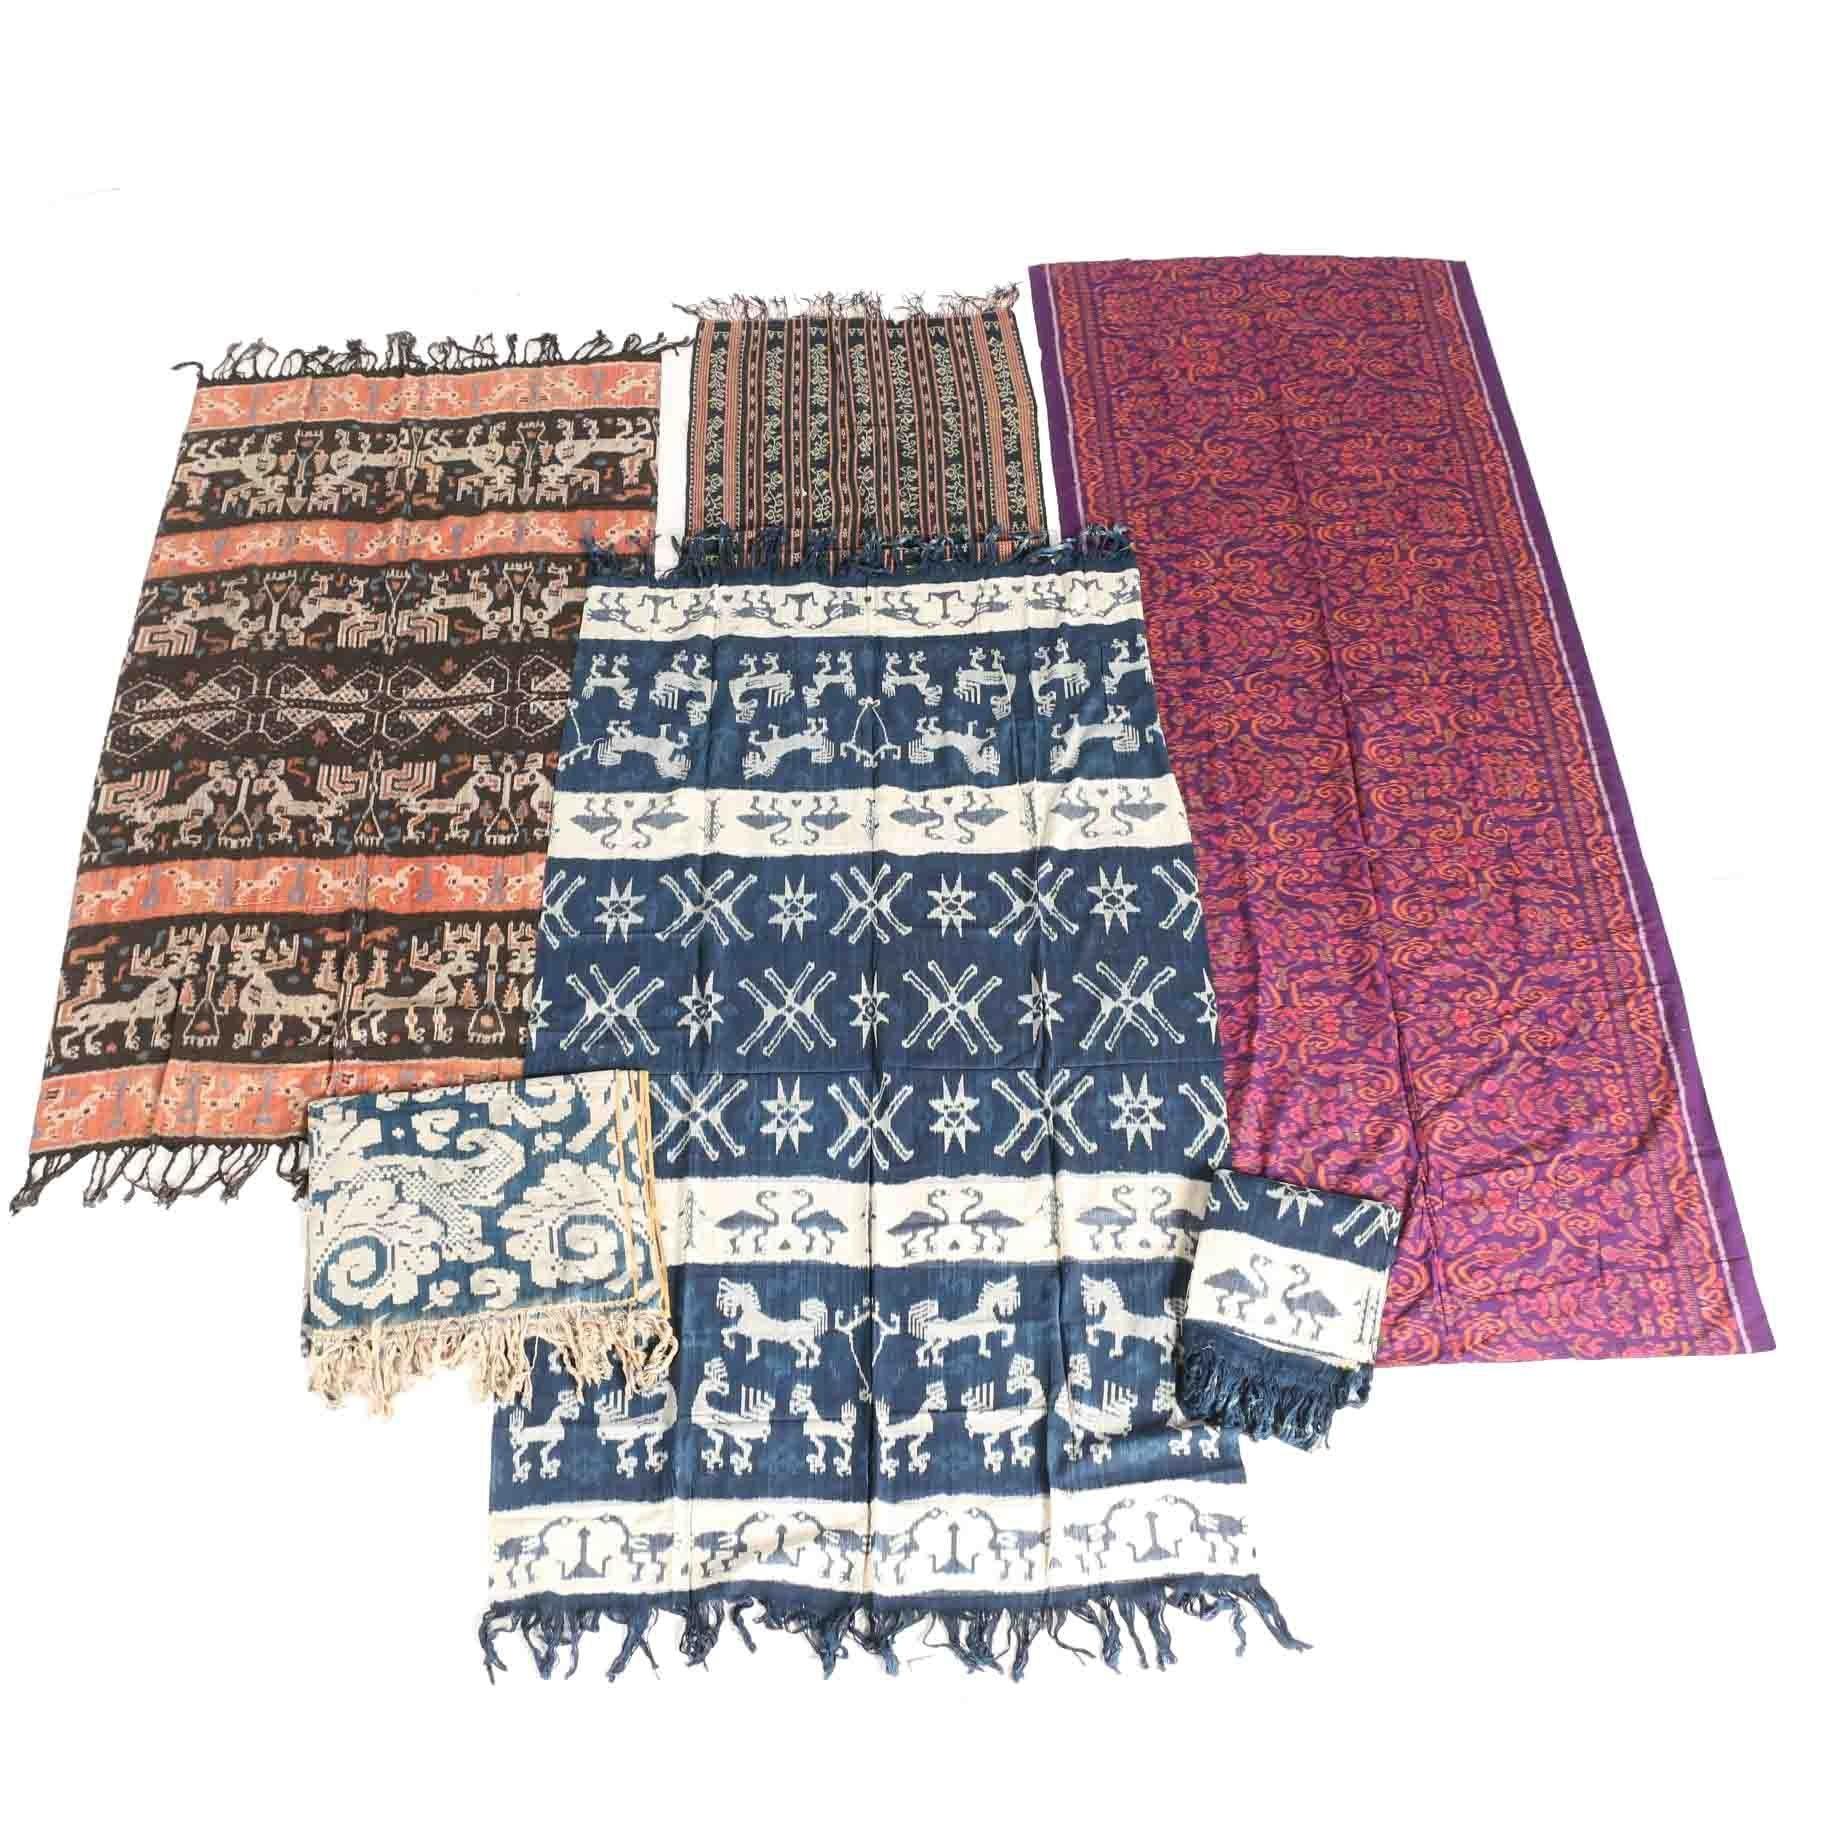 Collection of Ikat Fabrics